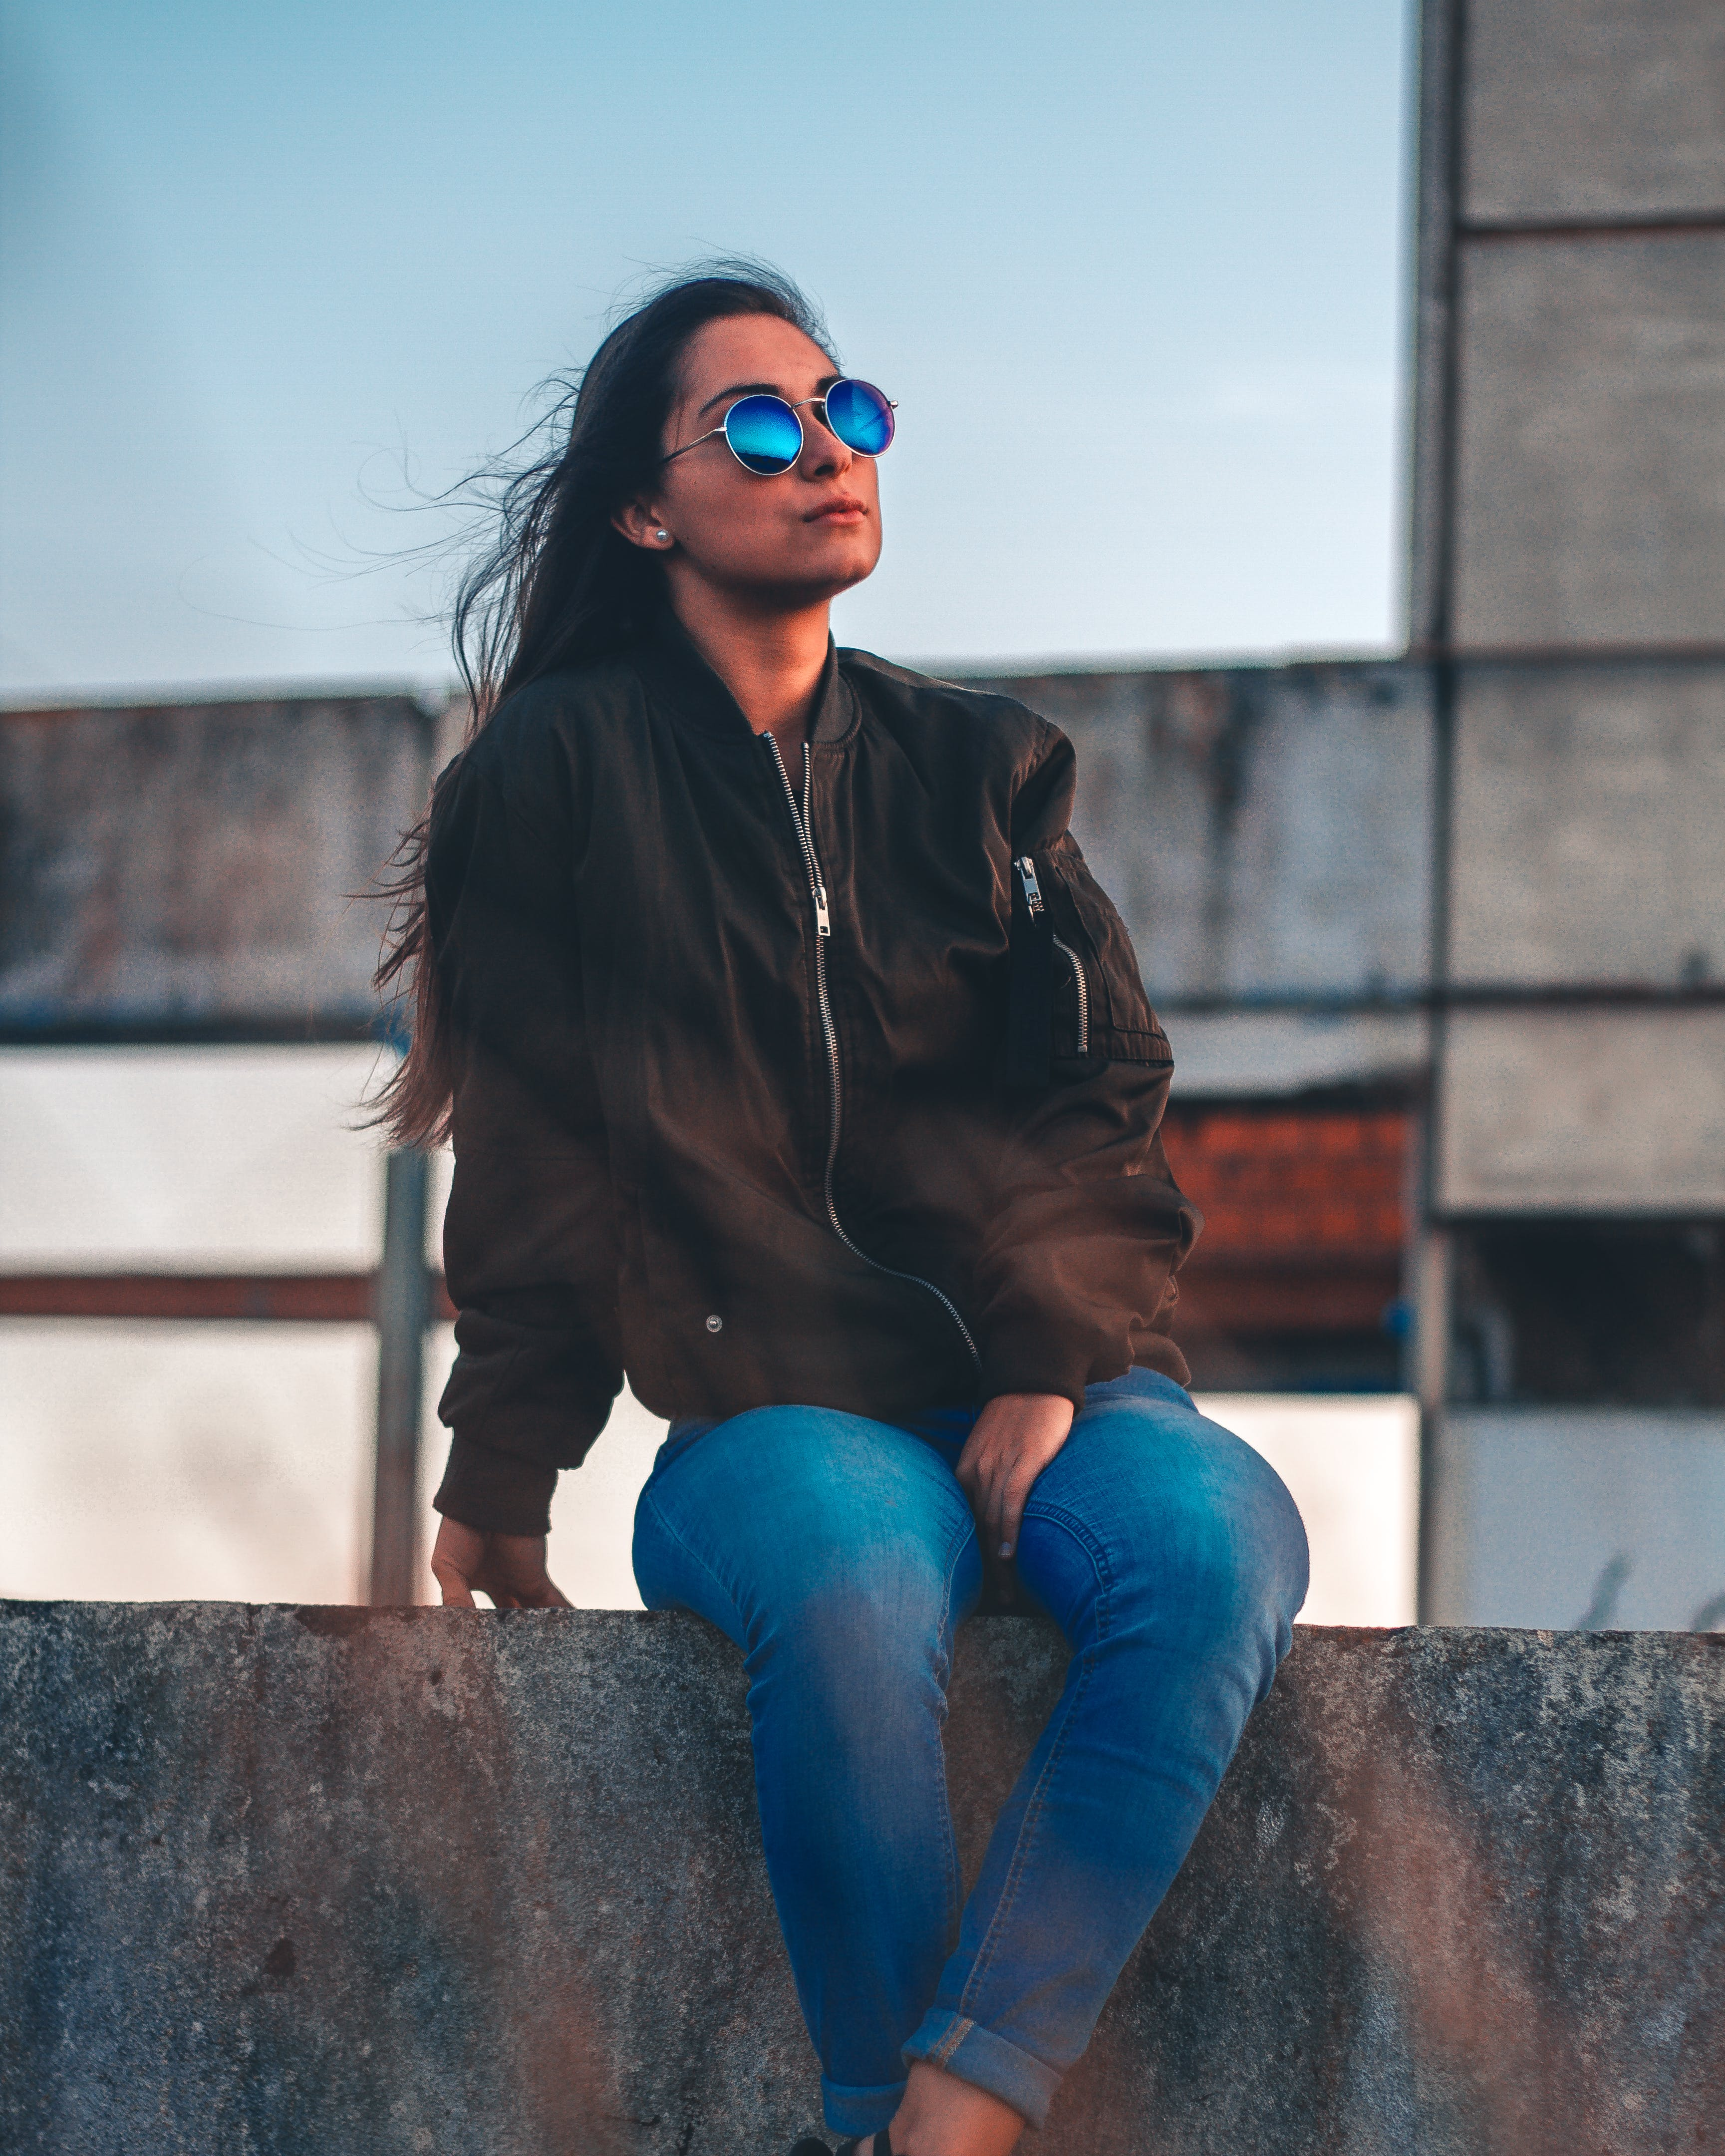 Woman Wearing Black Bomber Jacket